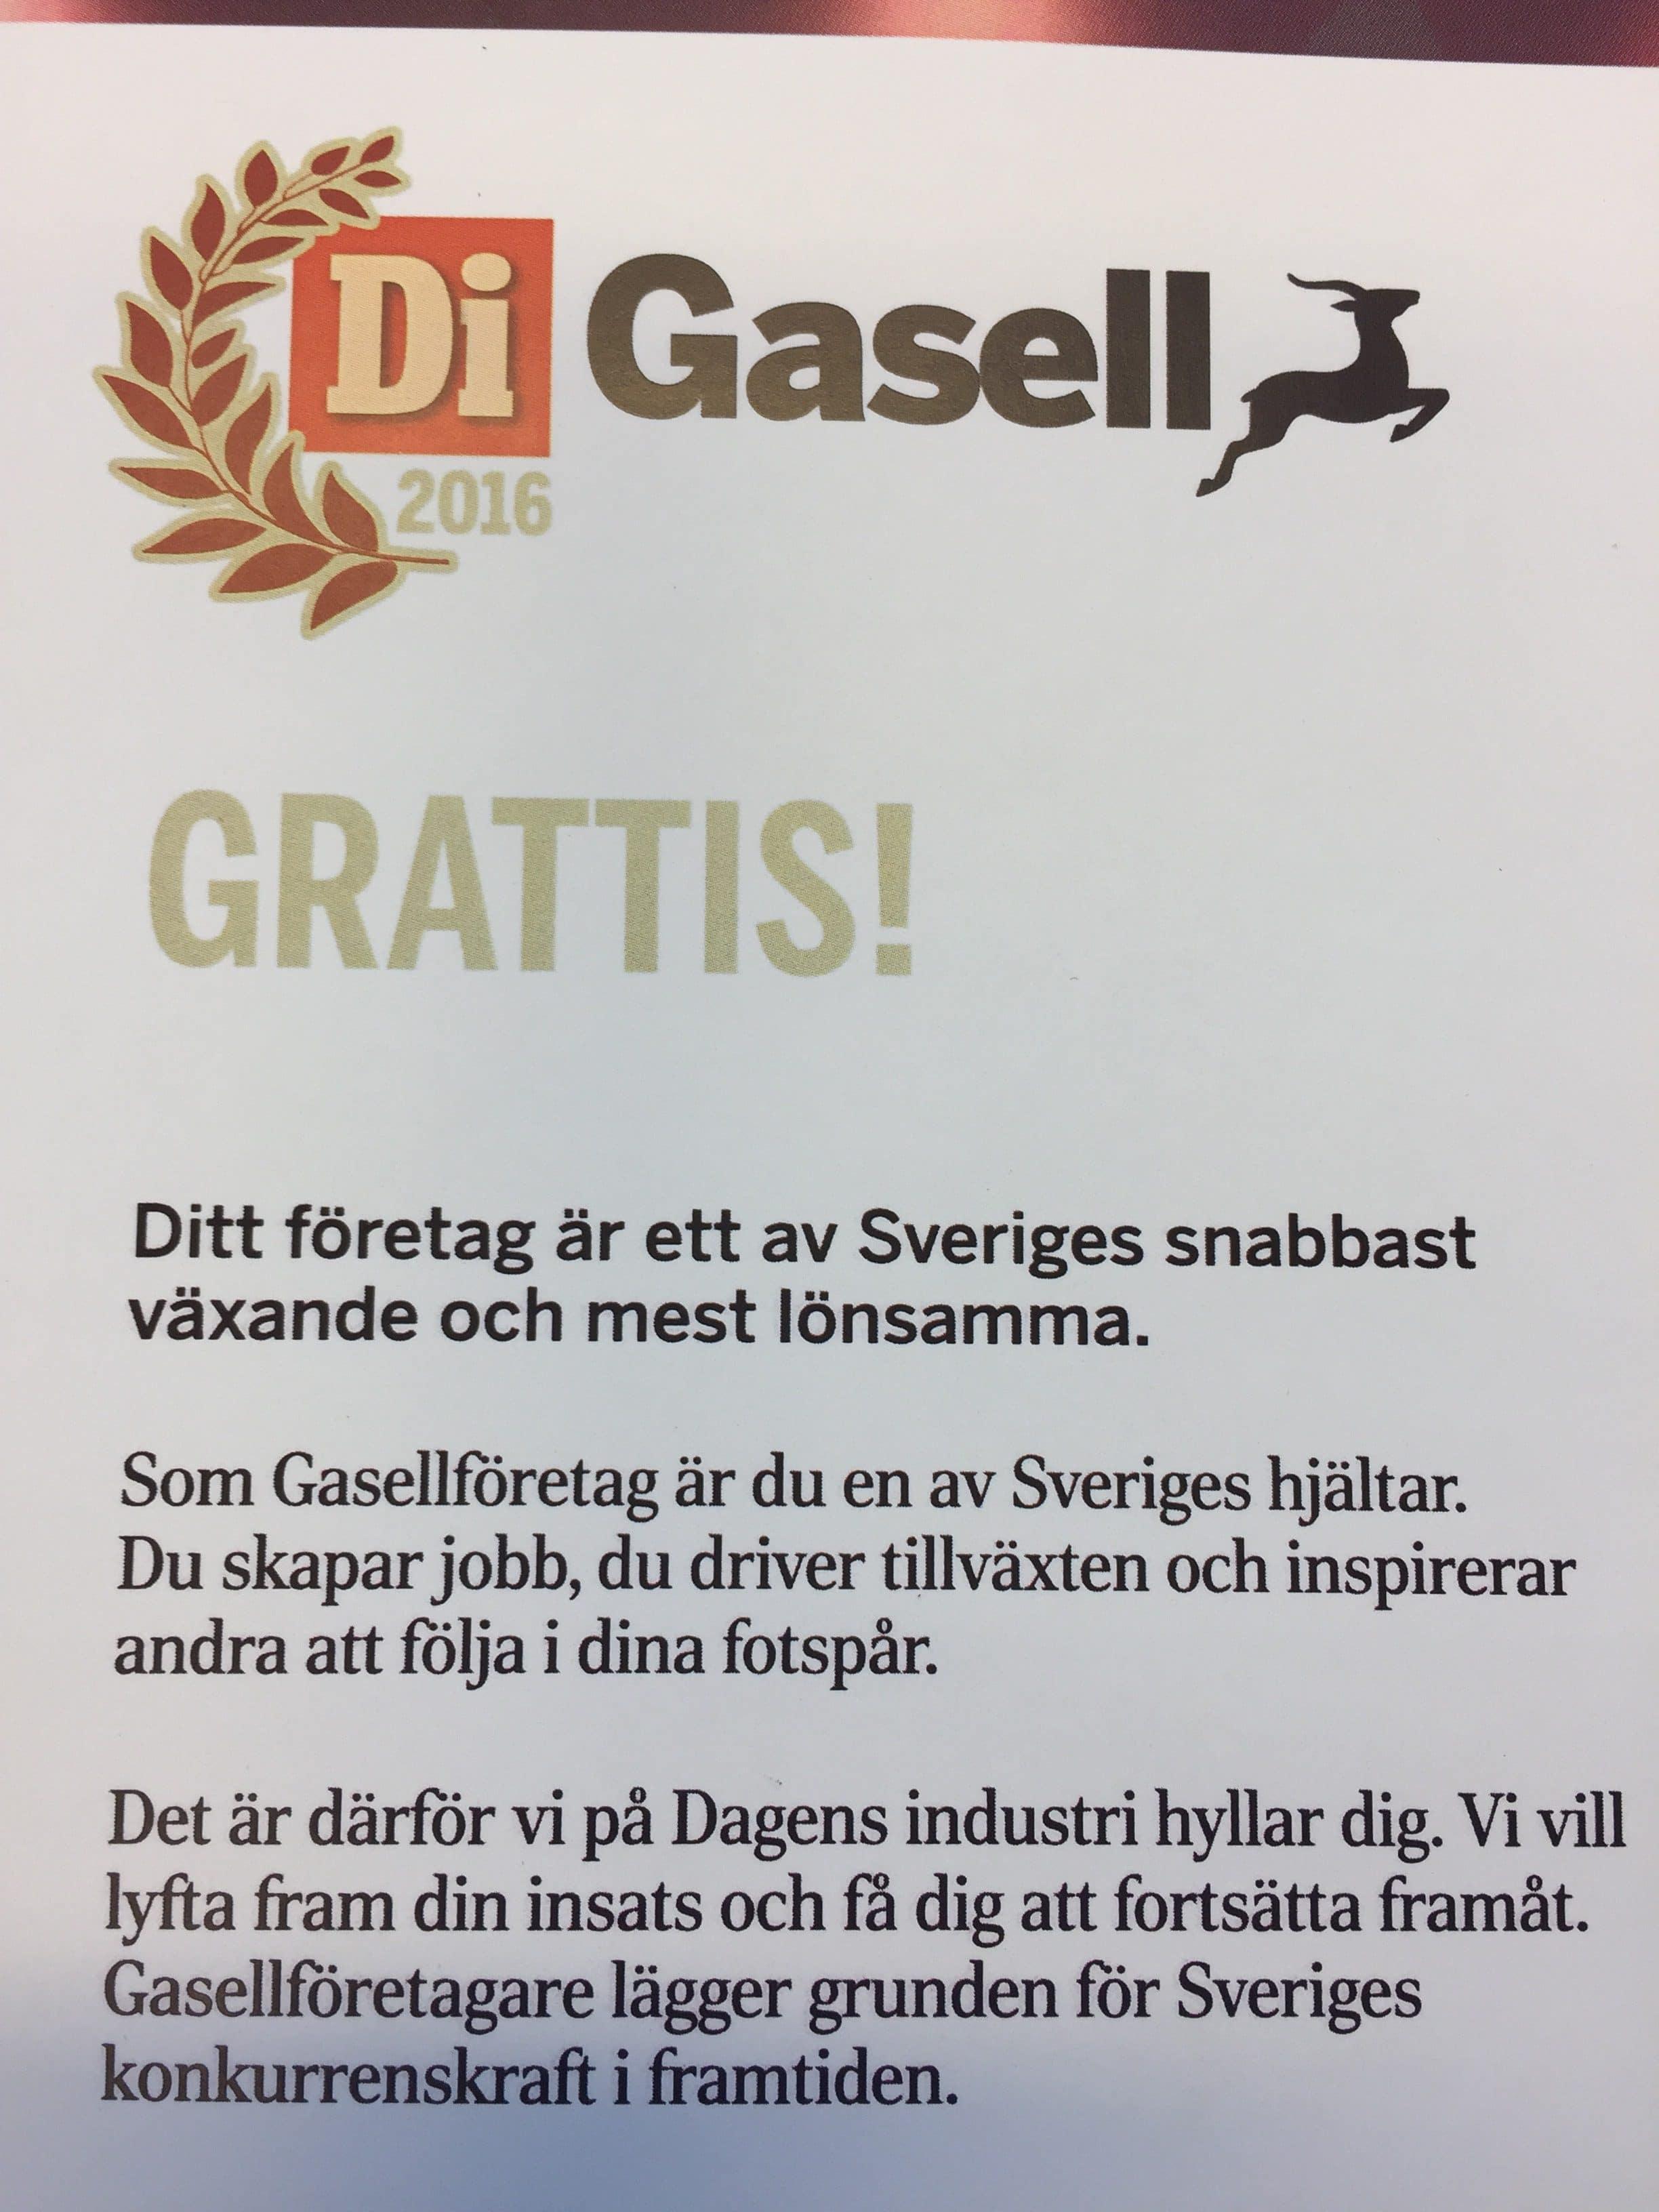 allblastring-di-gasell-2016